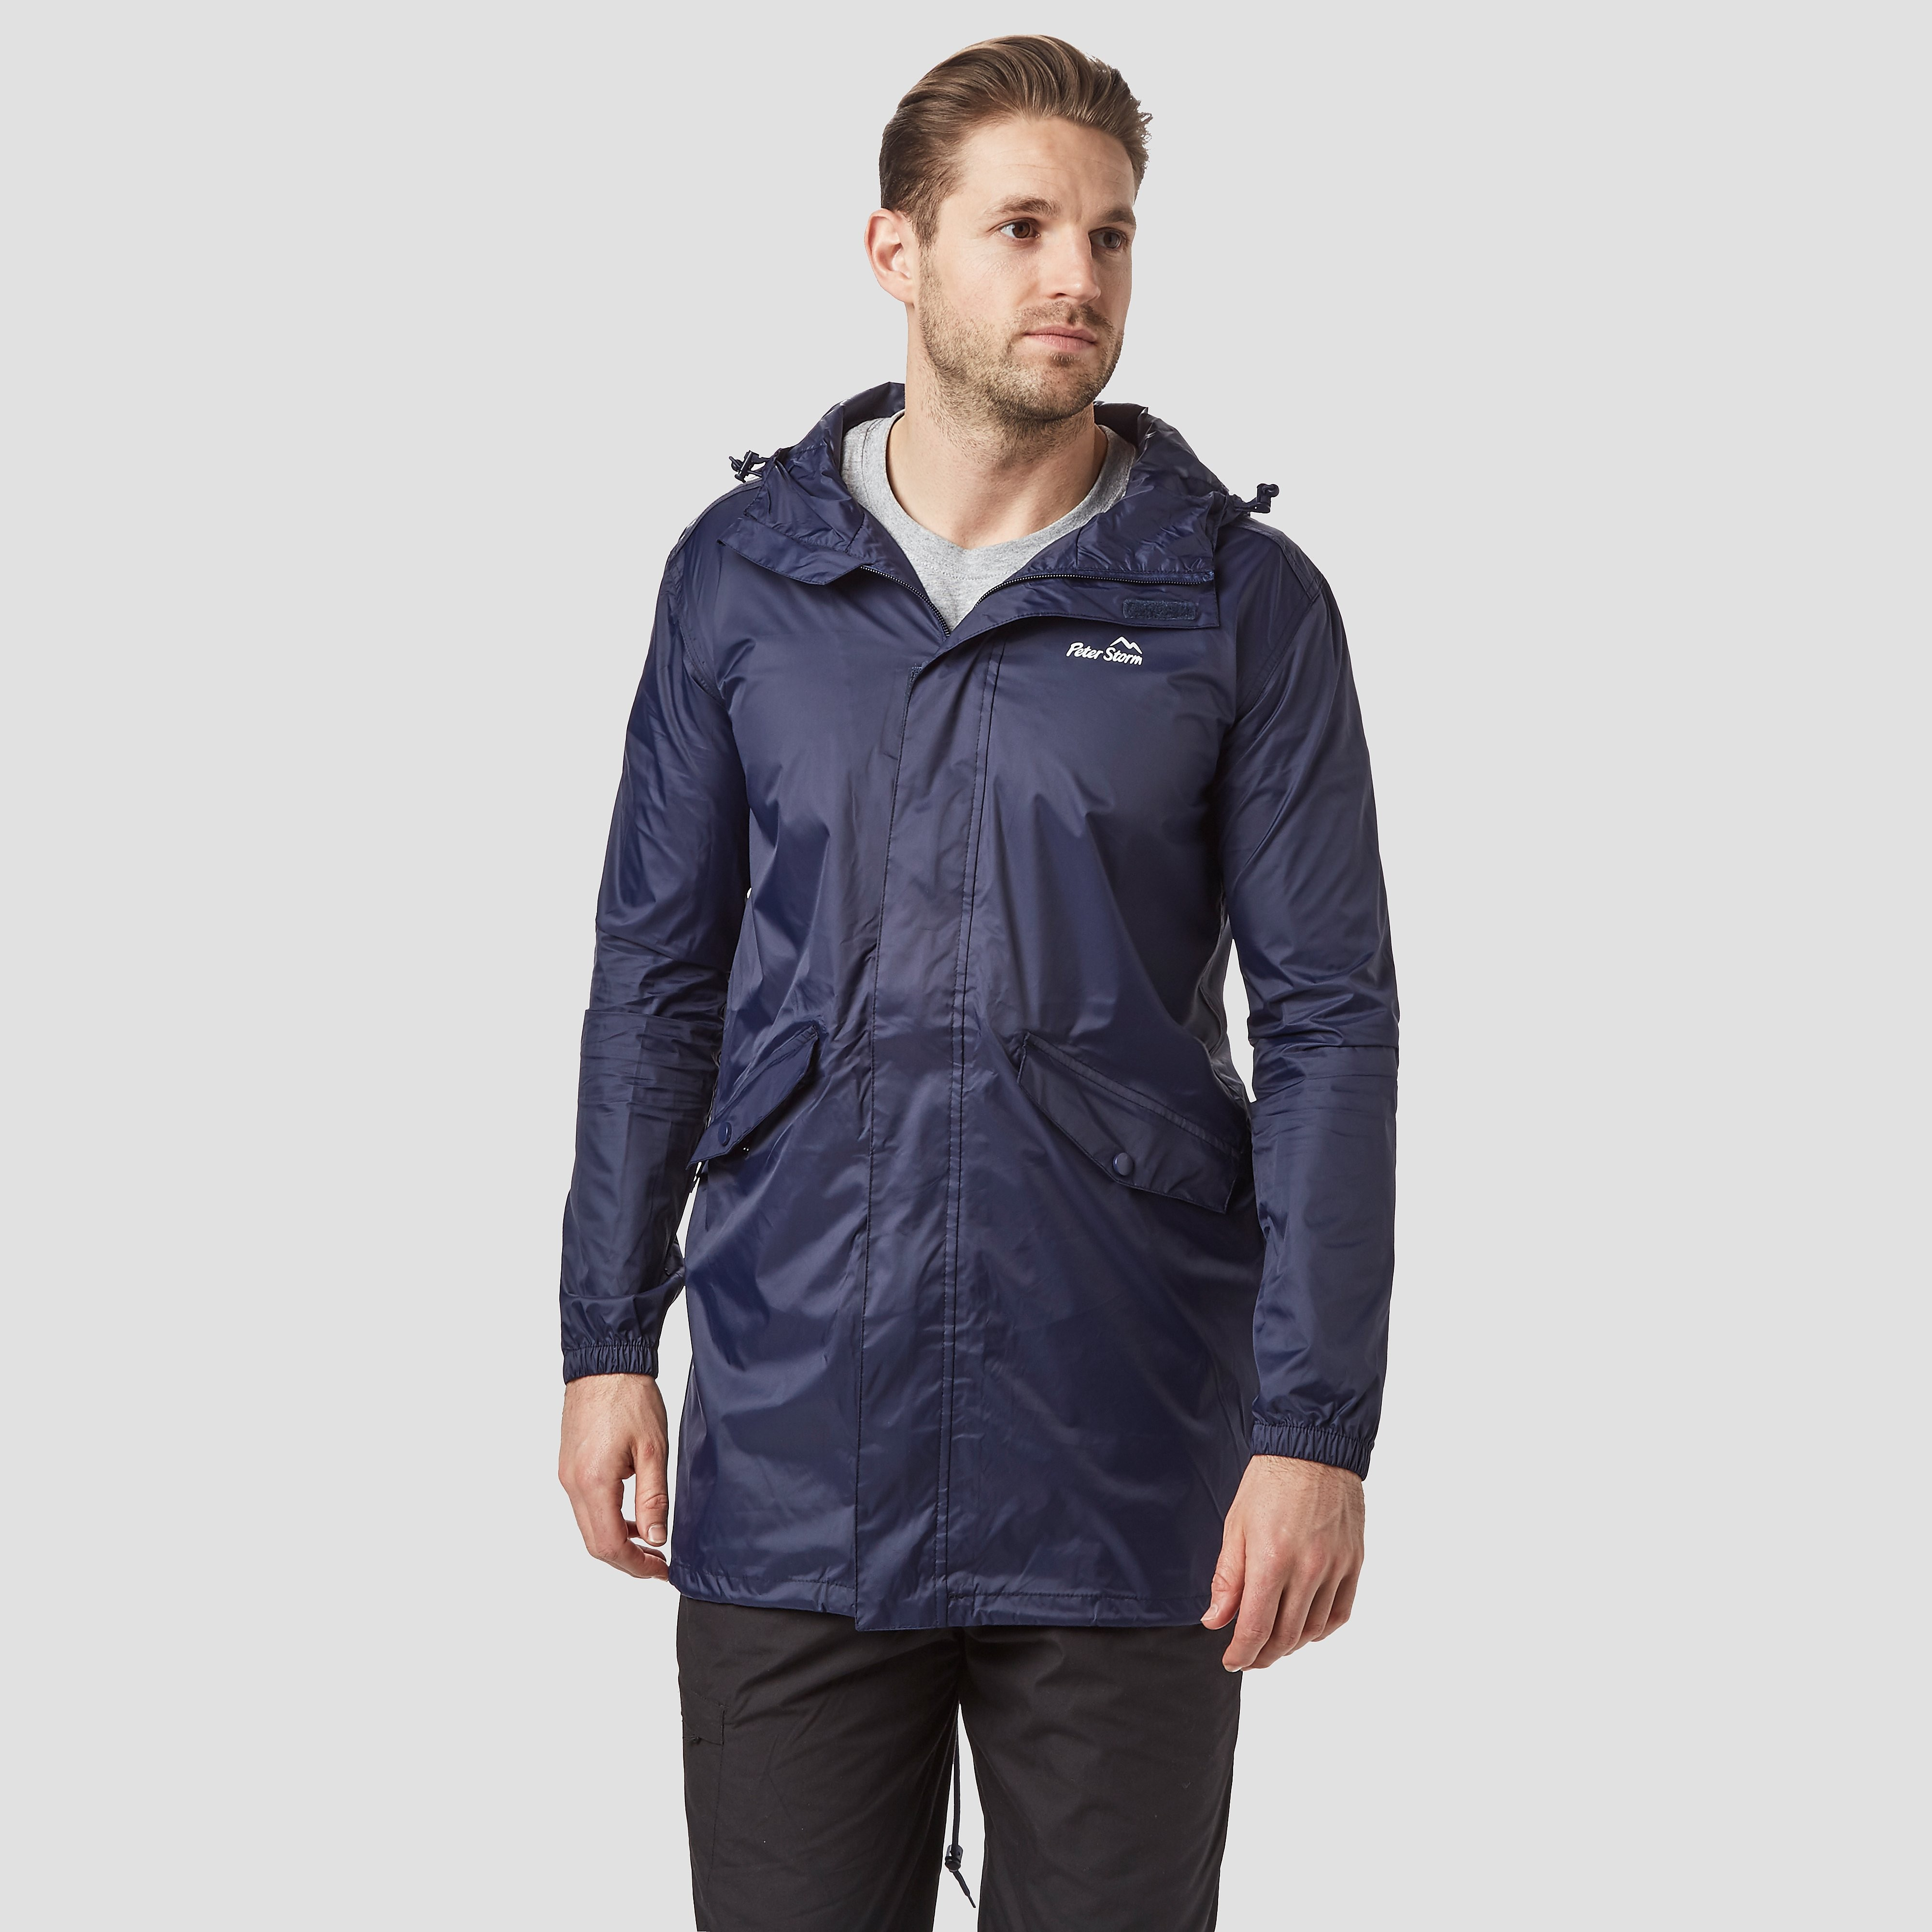 Peter Storm Parka-In-A-Pack Waterproof Men's Jacket